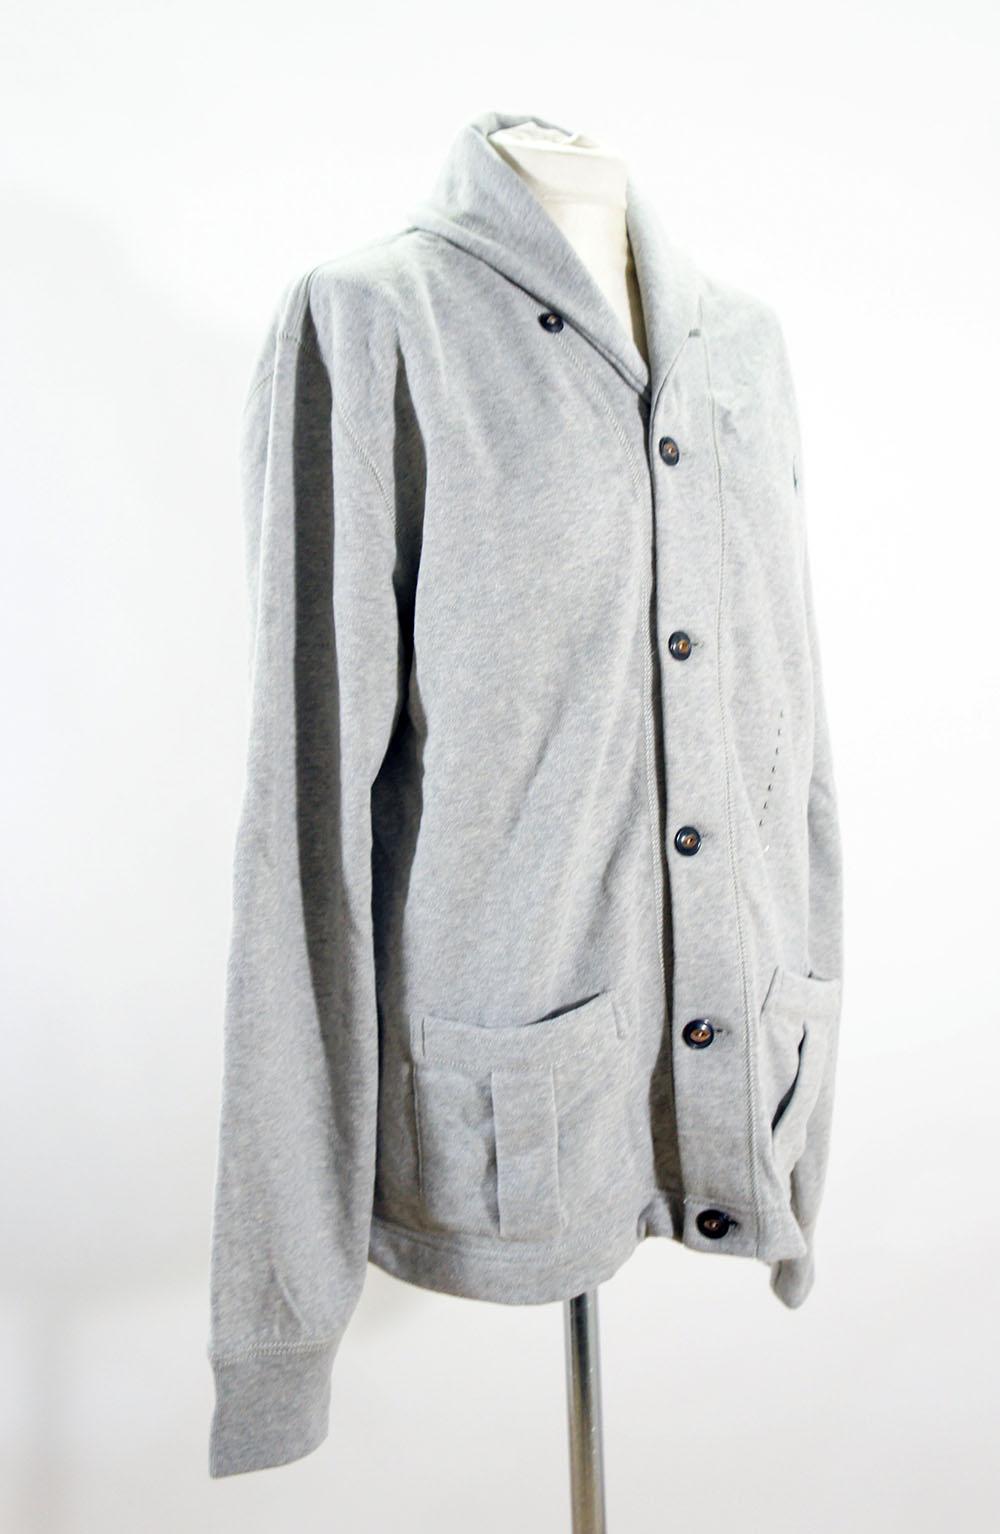 ralph lauren cardigan jacke pullover herren gr l neu grau ebay. Black Bedroom Furniture Sets. Home Design Ideas